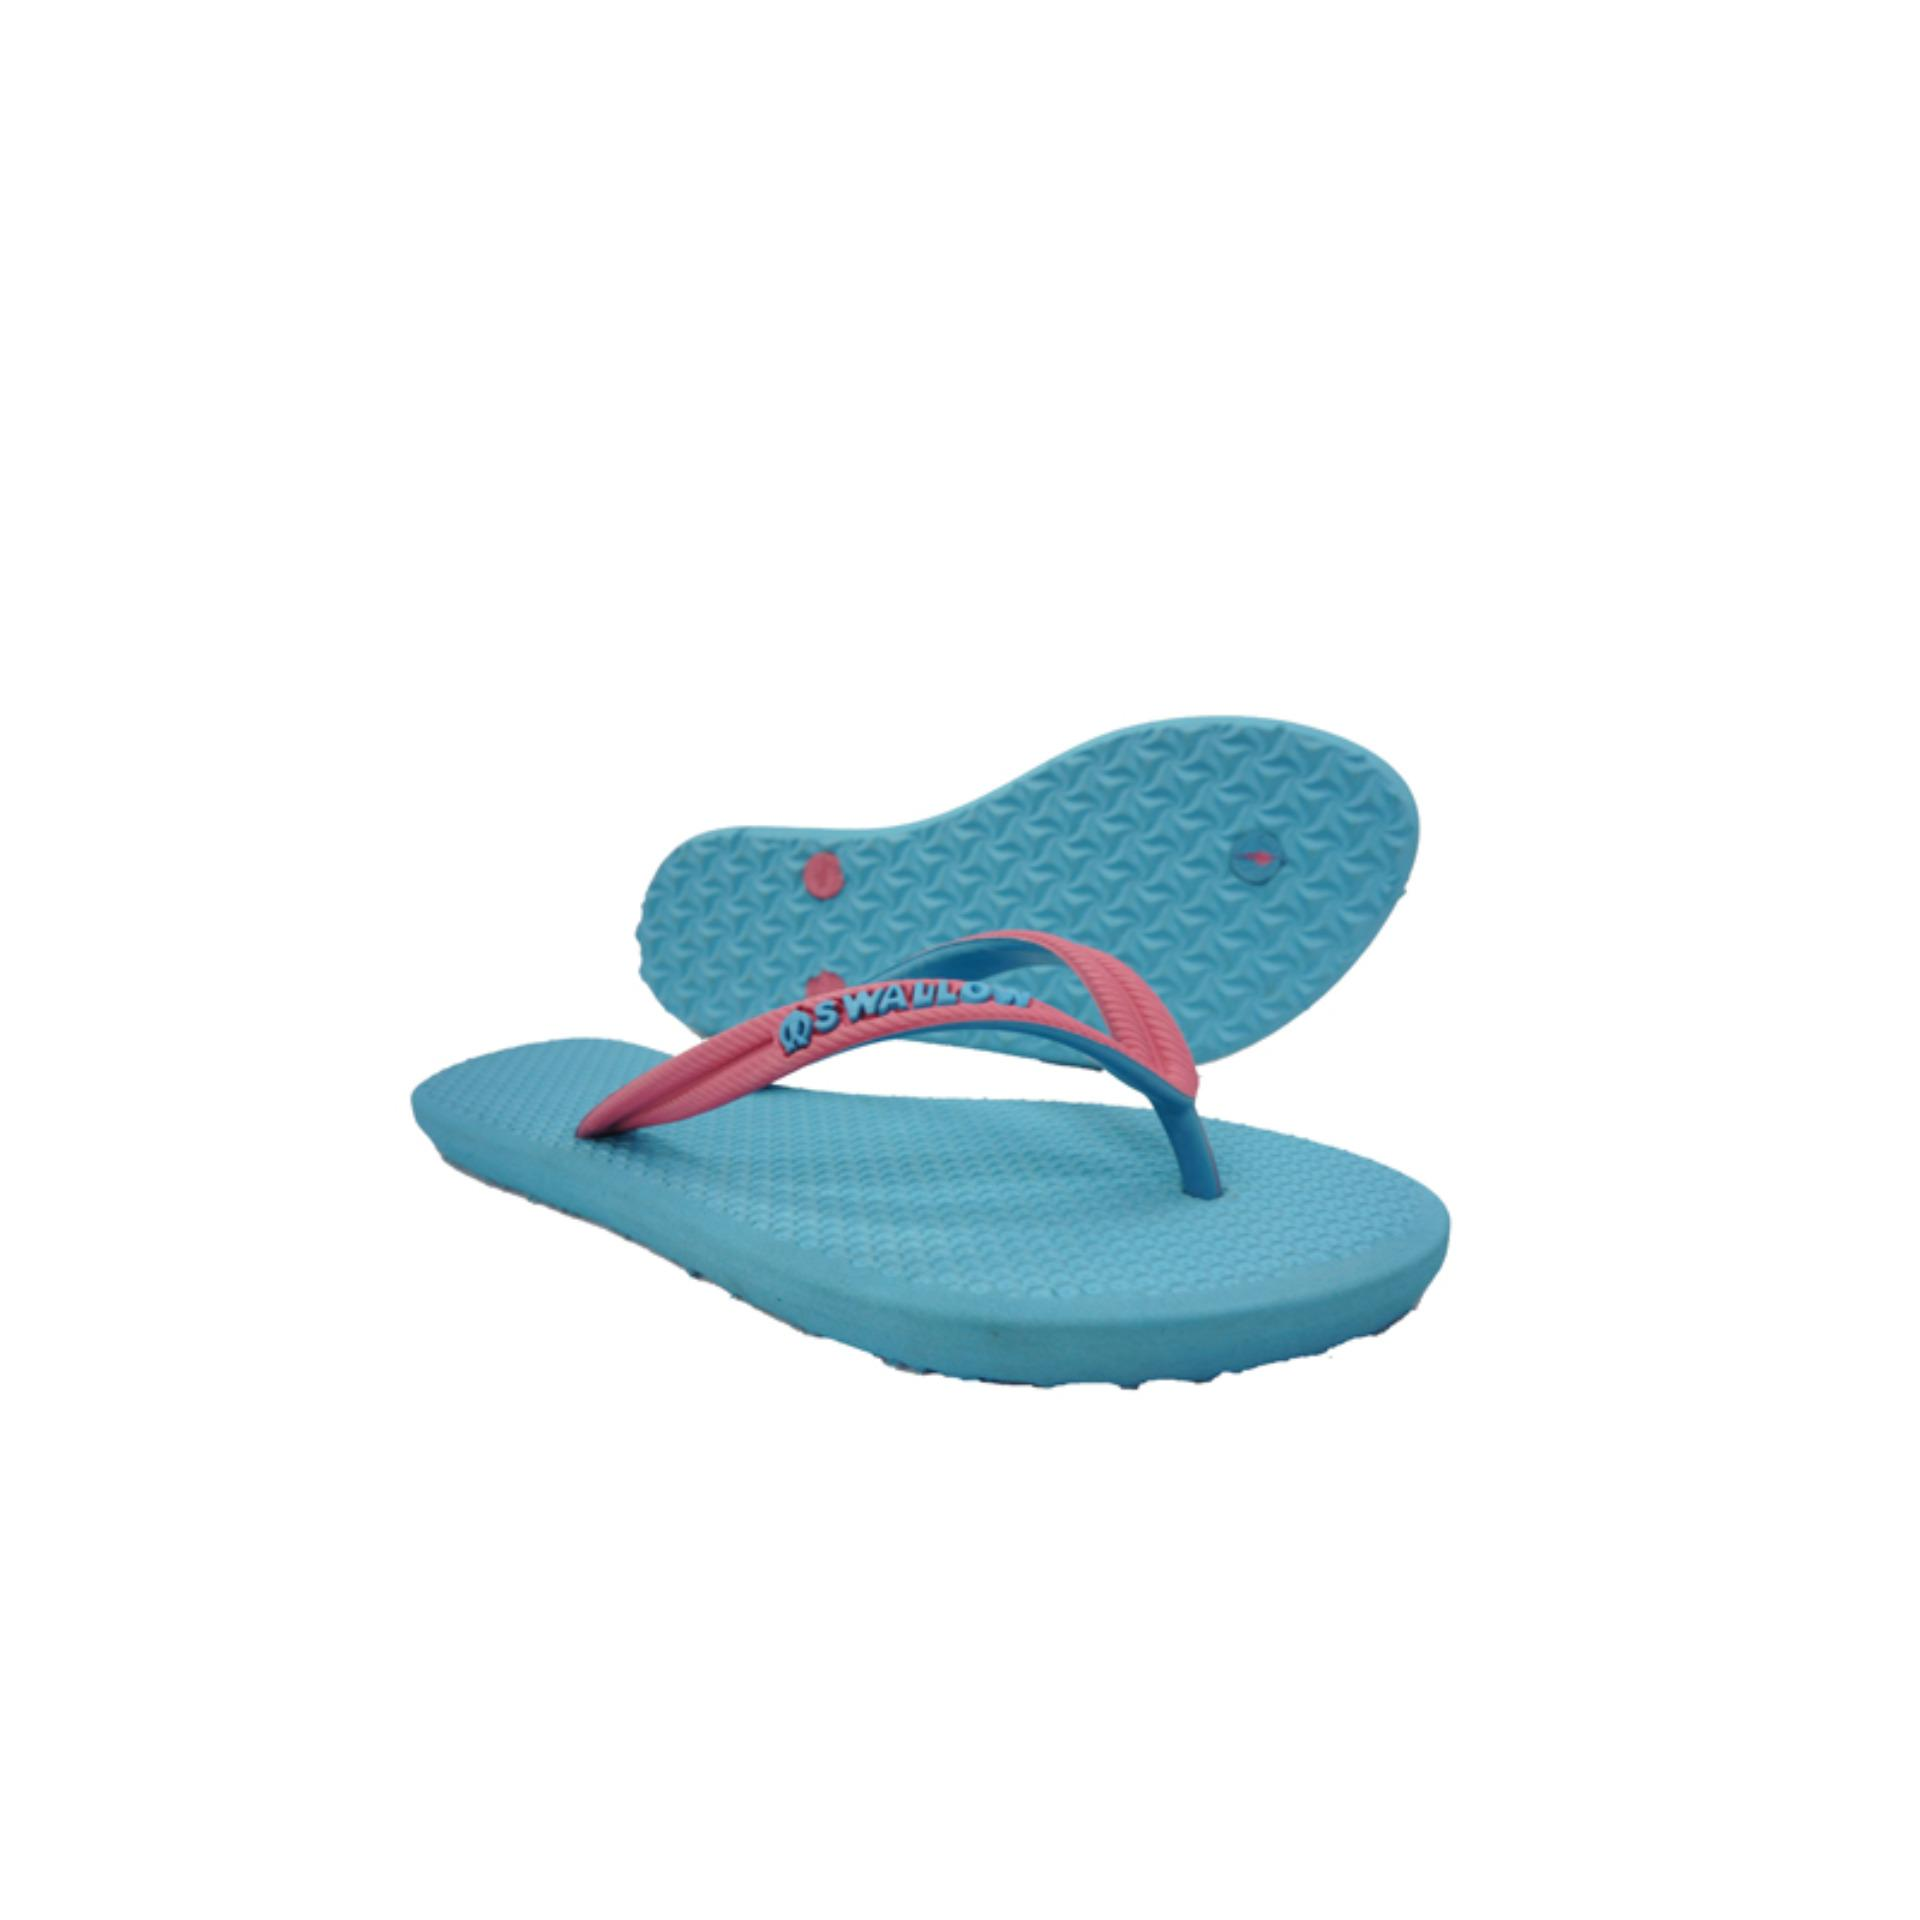 Sandal Swallow Slimfeet Wanita Allblack Logo Biru Daftar Harga Premium Spectrum Pria Maroon 40 Bundle 3